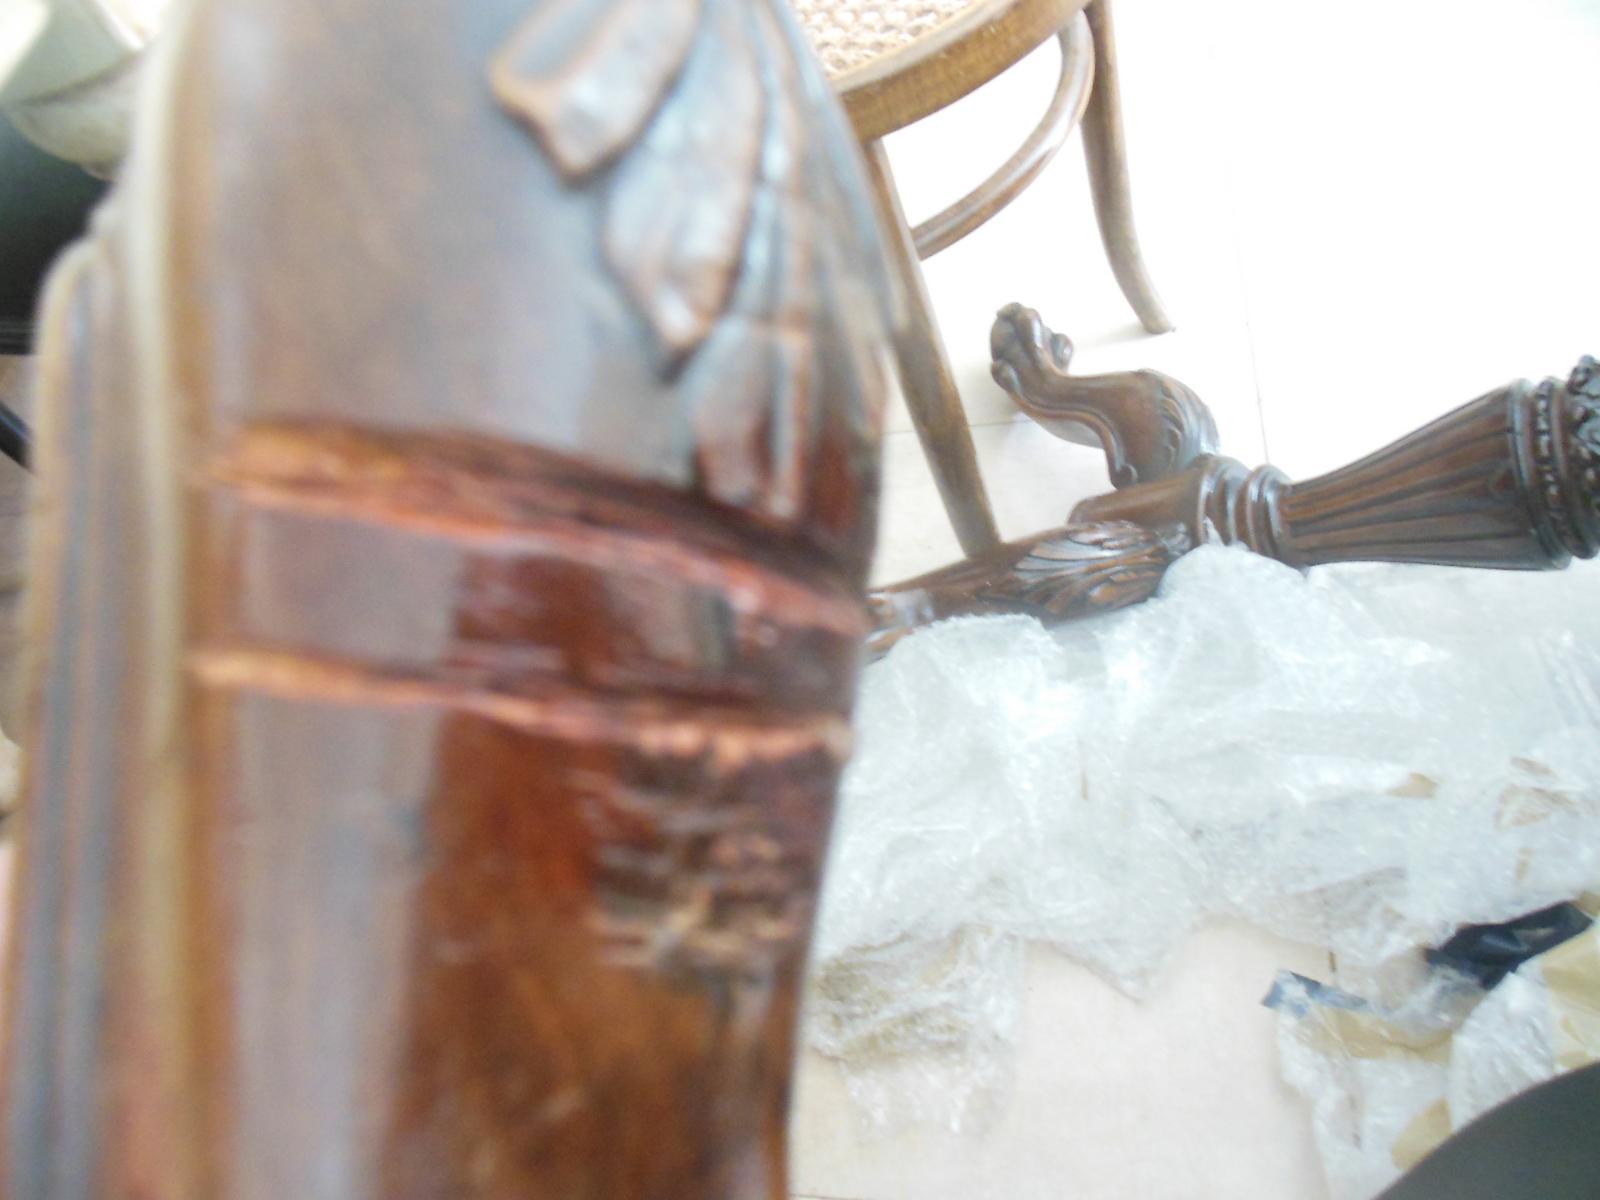 restaurando pata chippendale restaurando antiguedades en la josa shop 00